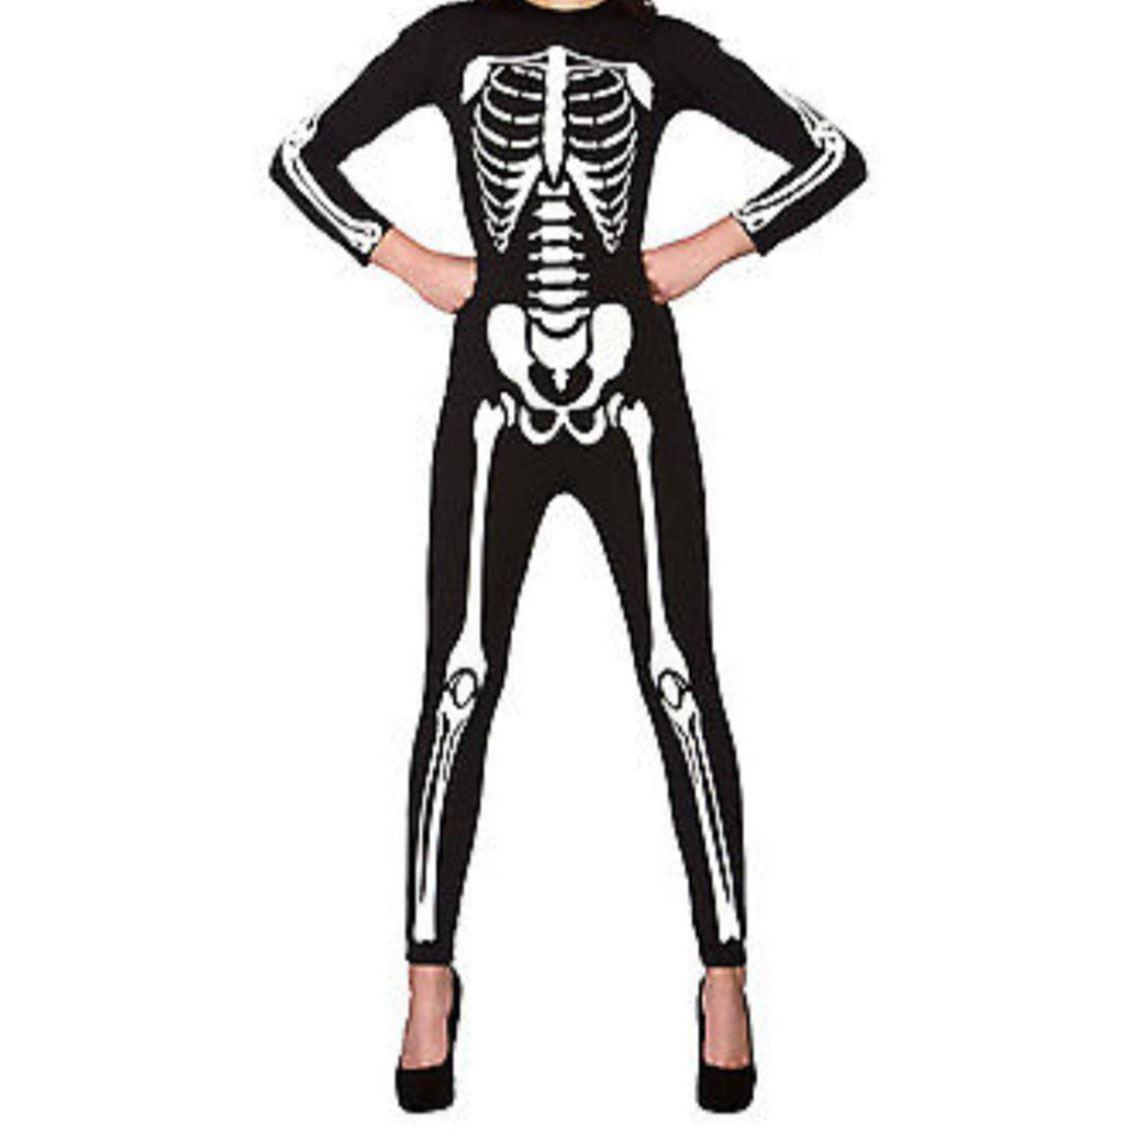 womens halloween costume skeleton leggings dress top jumpsuit